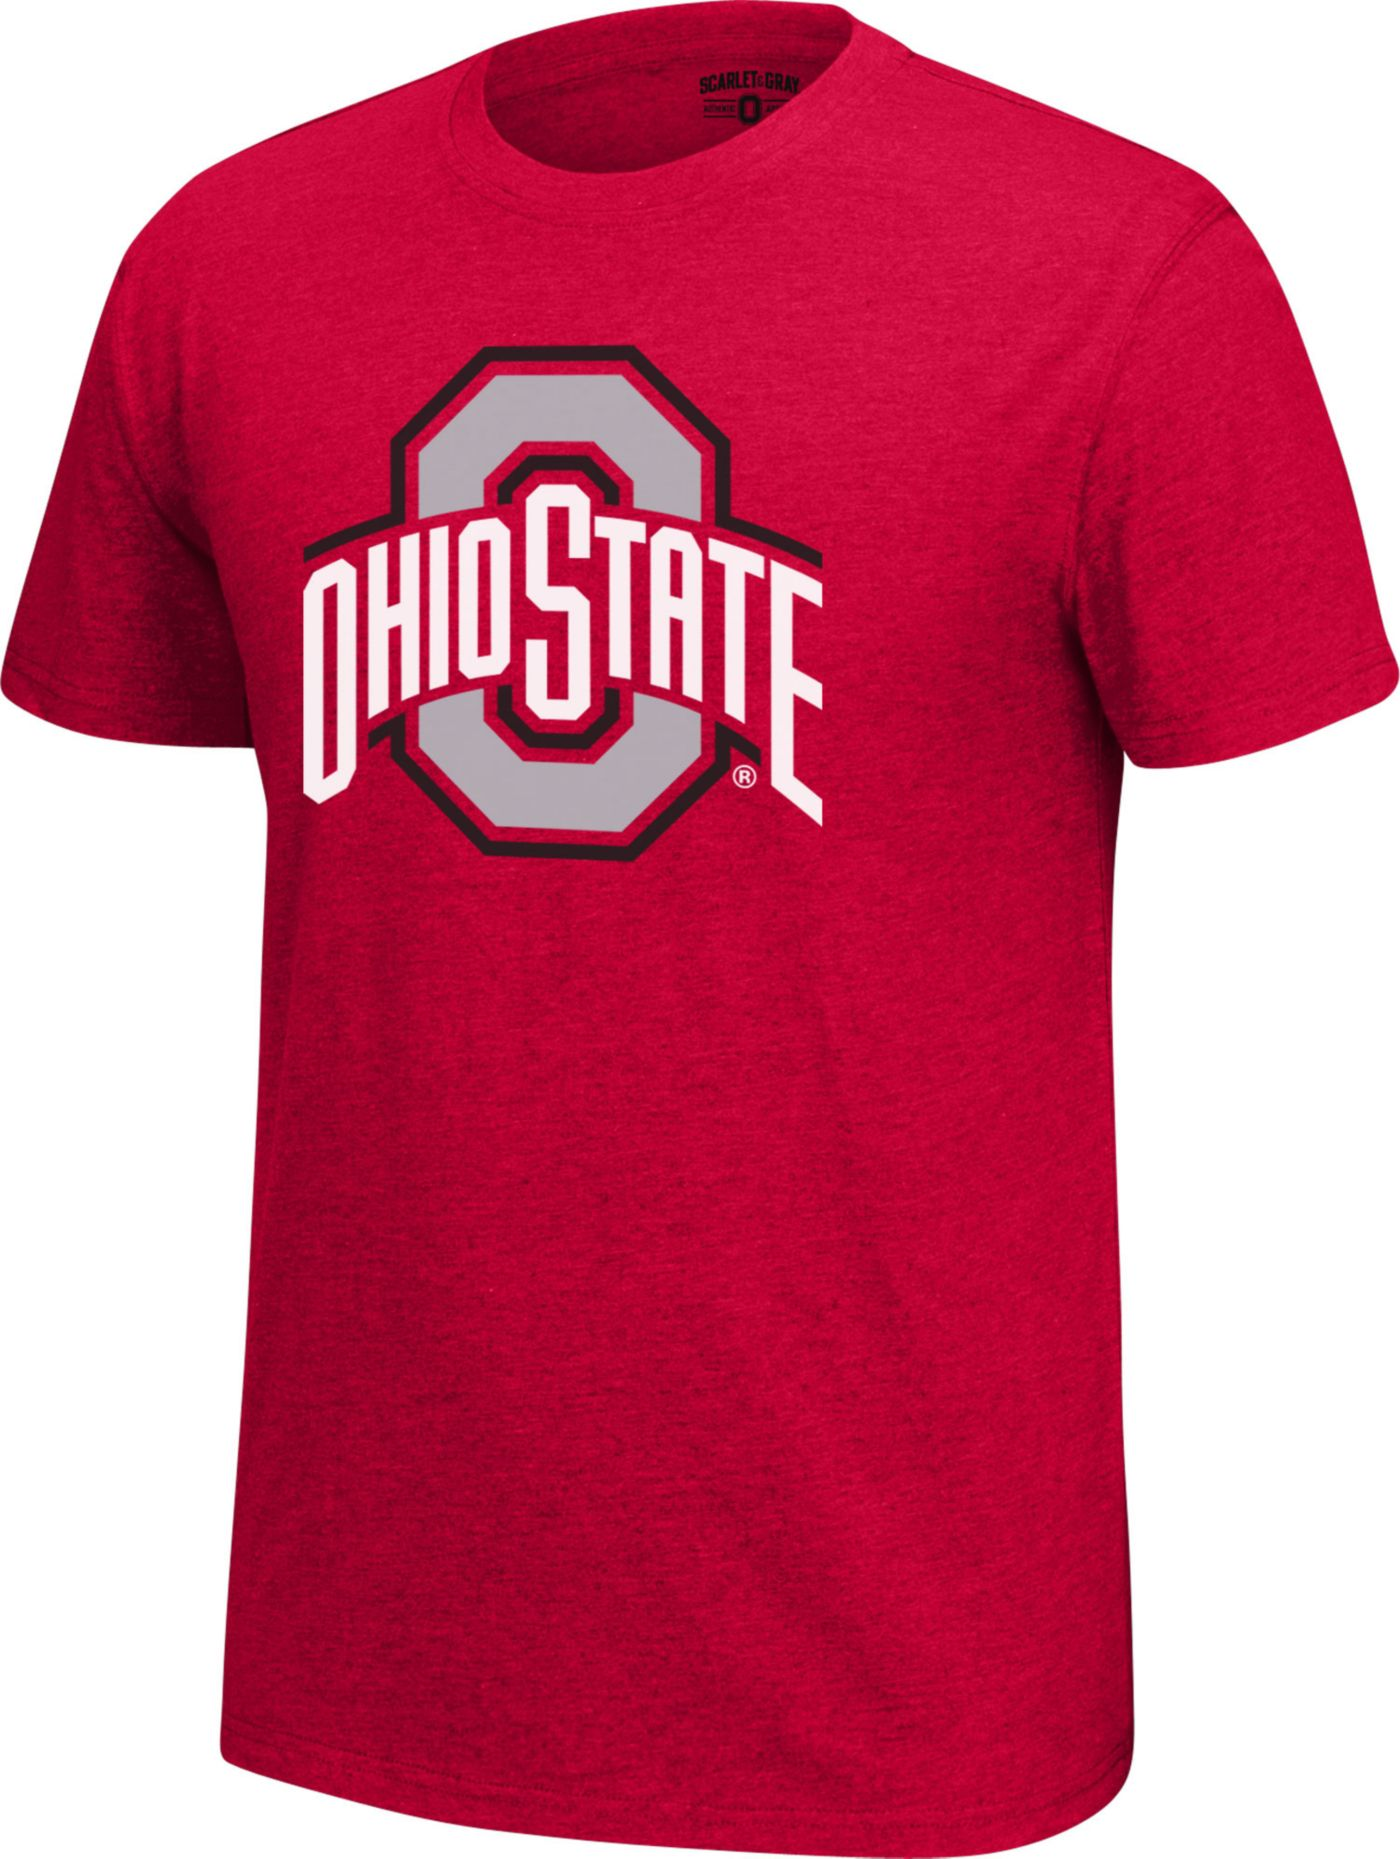 Scarlet & Gray Men's Ohio State Buckeyes Scarlet Staple T-Shirt